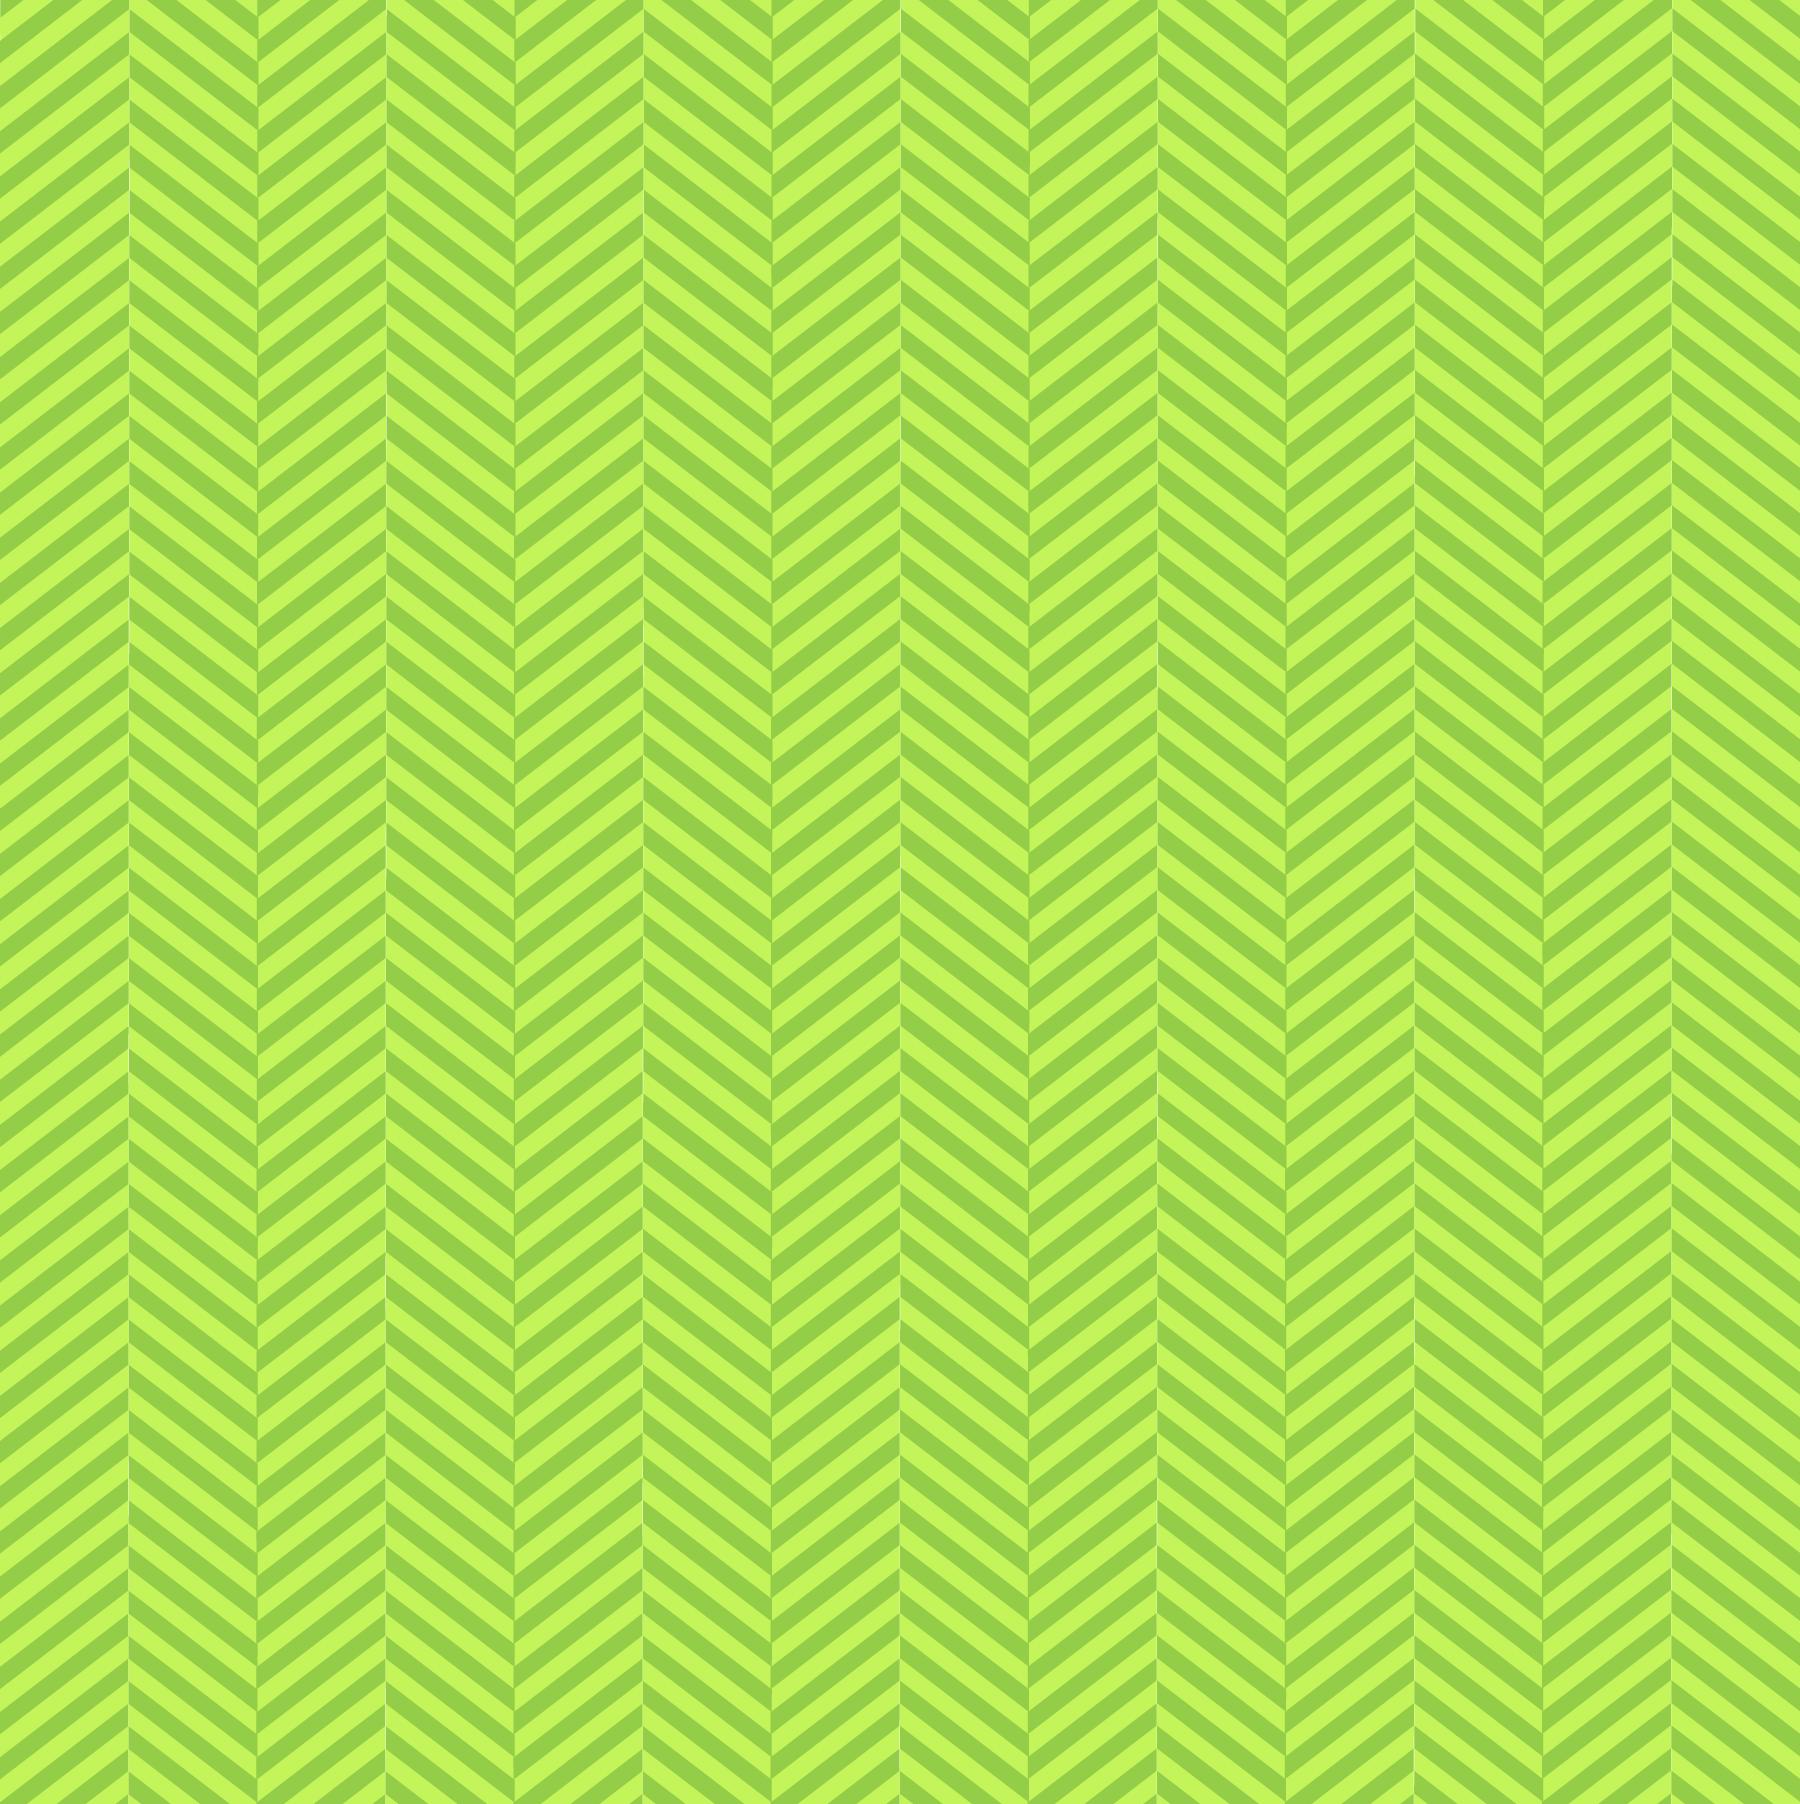 herringbone green-01.jpg